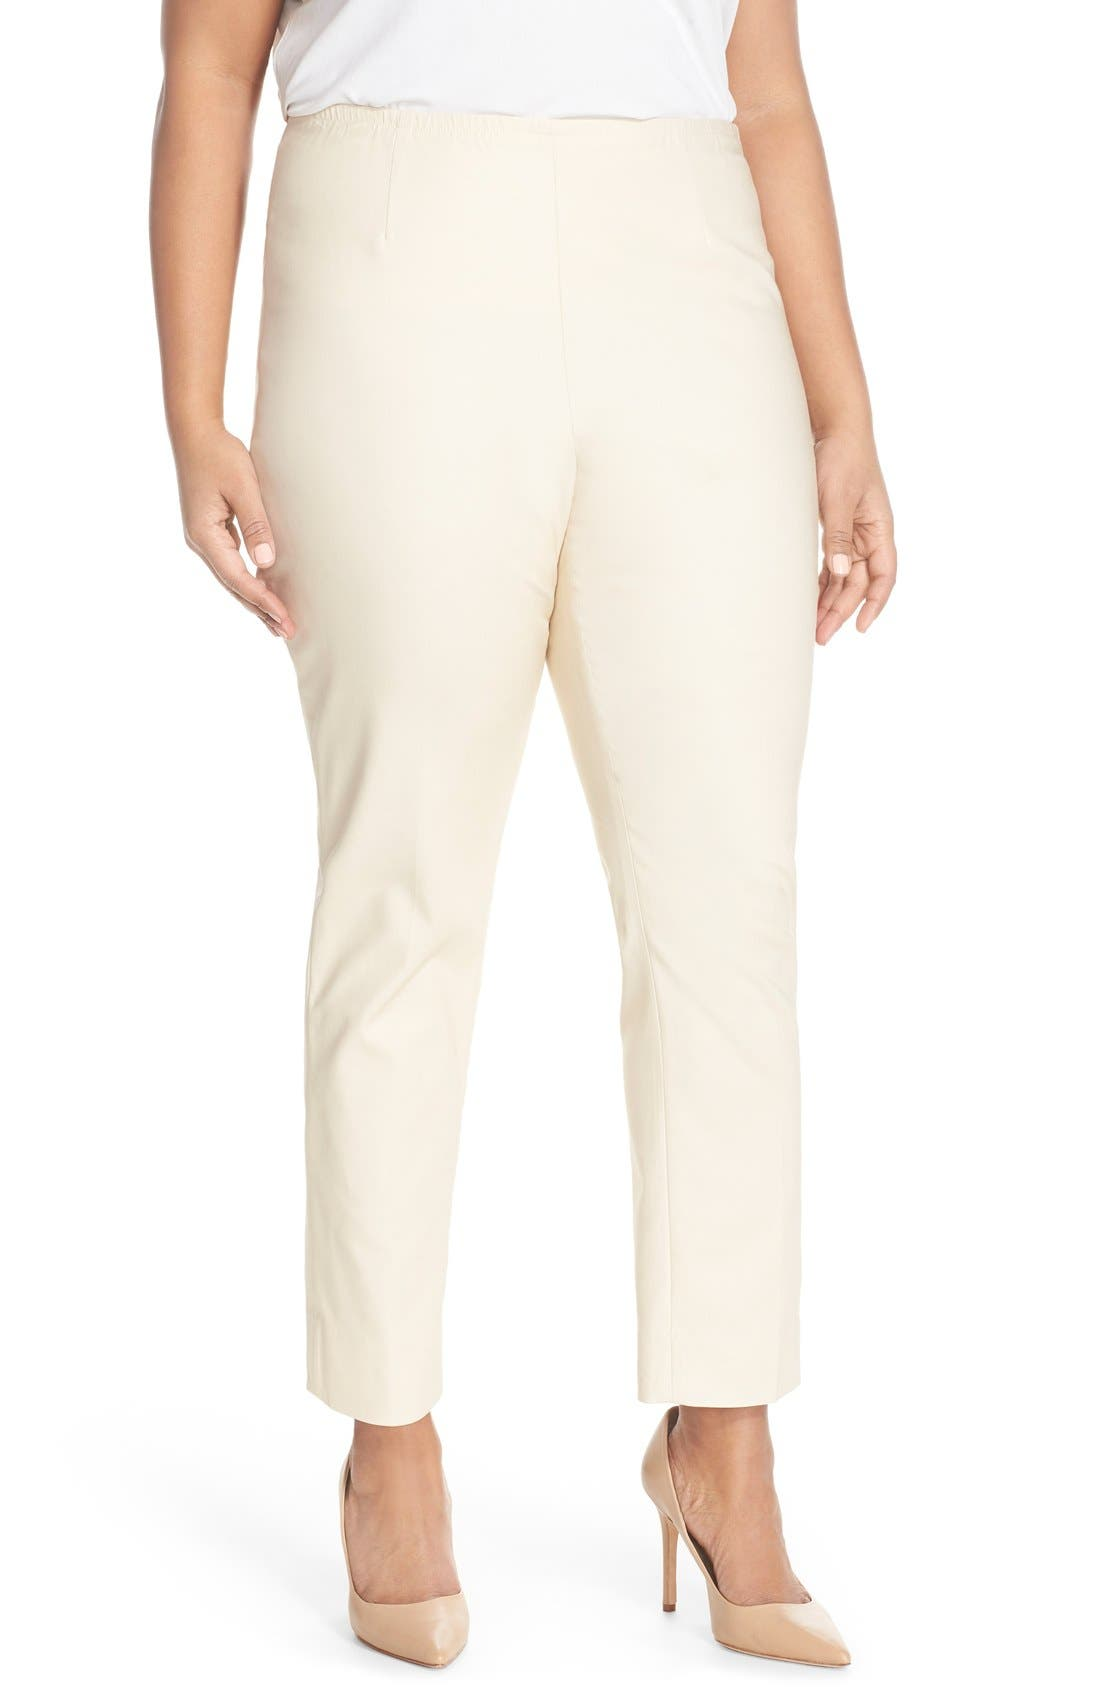 NIC+ZOE 'Perfect' High Rise Side Zip Pants, Main, color, SANDSHELL